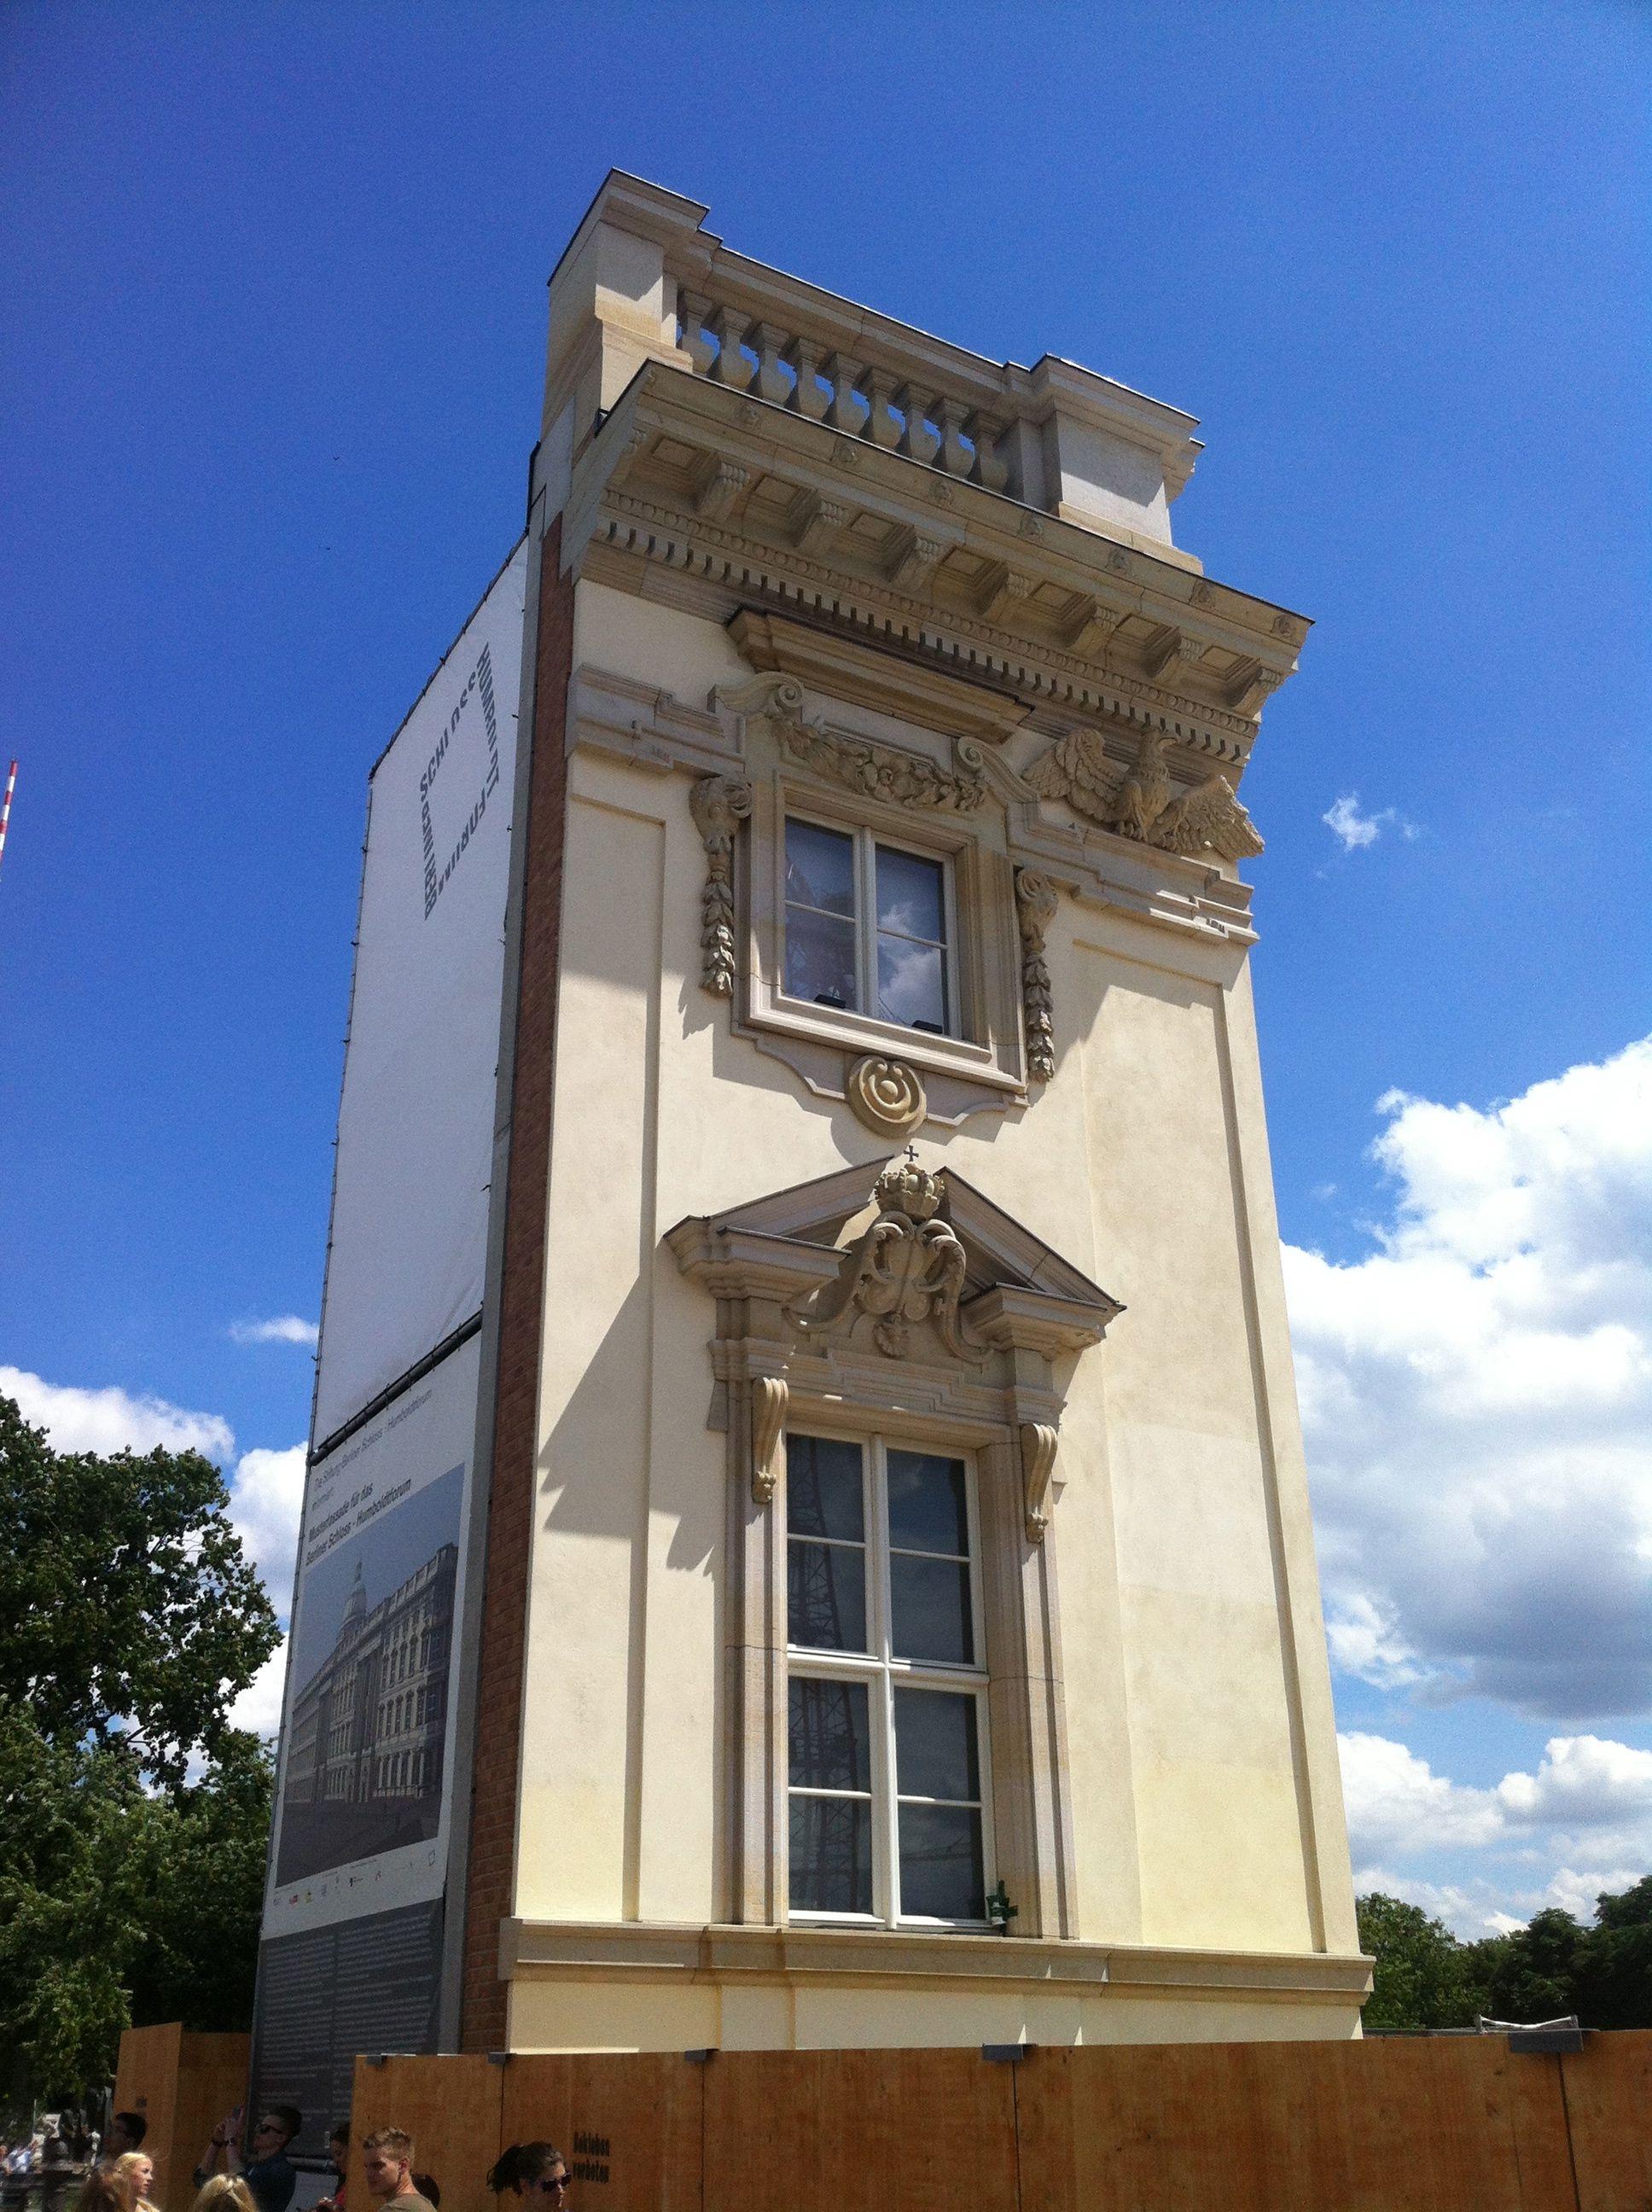 Fassadenelement des zukünftigen Berliner Stadtschlosses